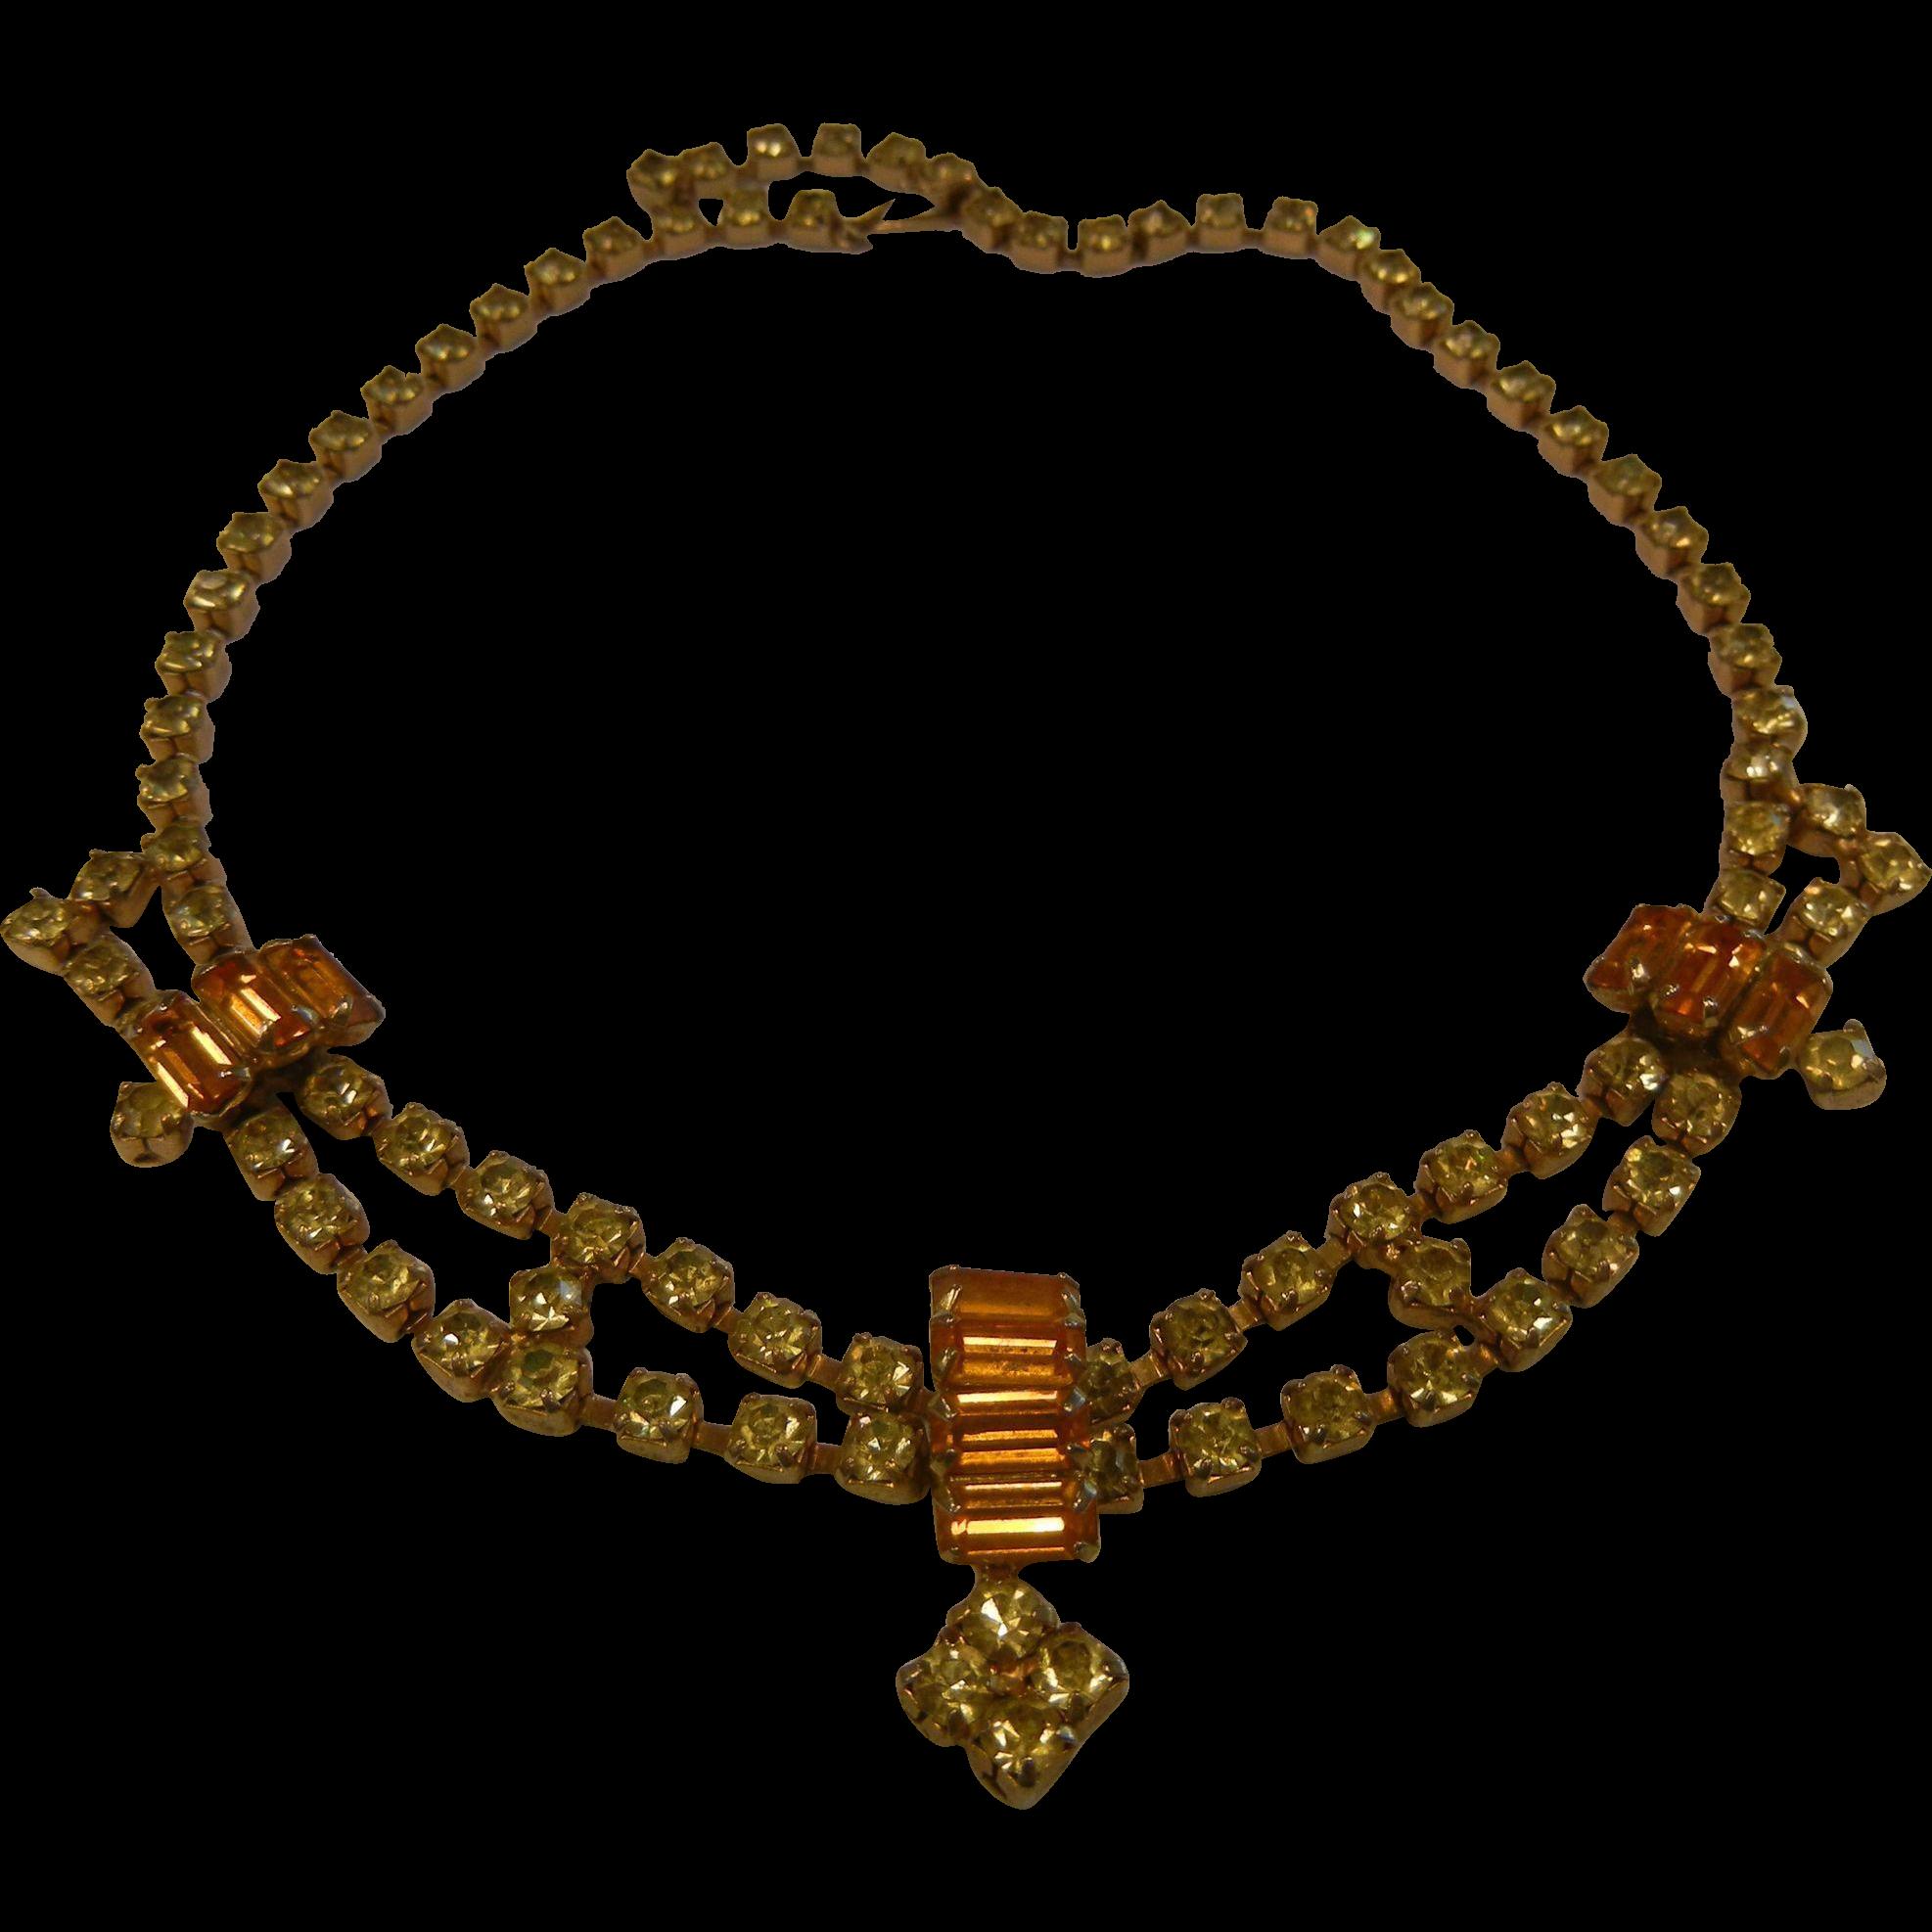 Fabulous Vintage Citrine Glass Rhinestone Costume Jewelry Choker Necklace